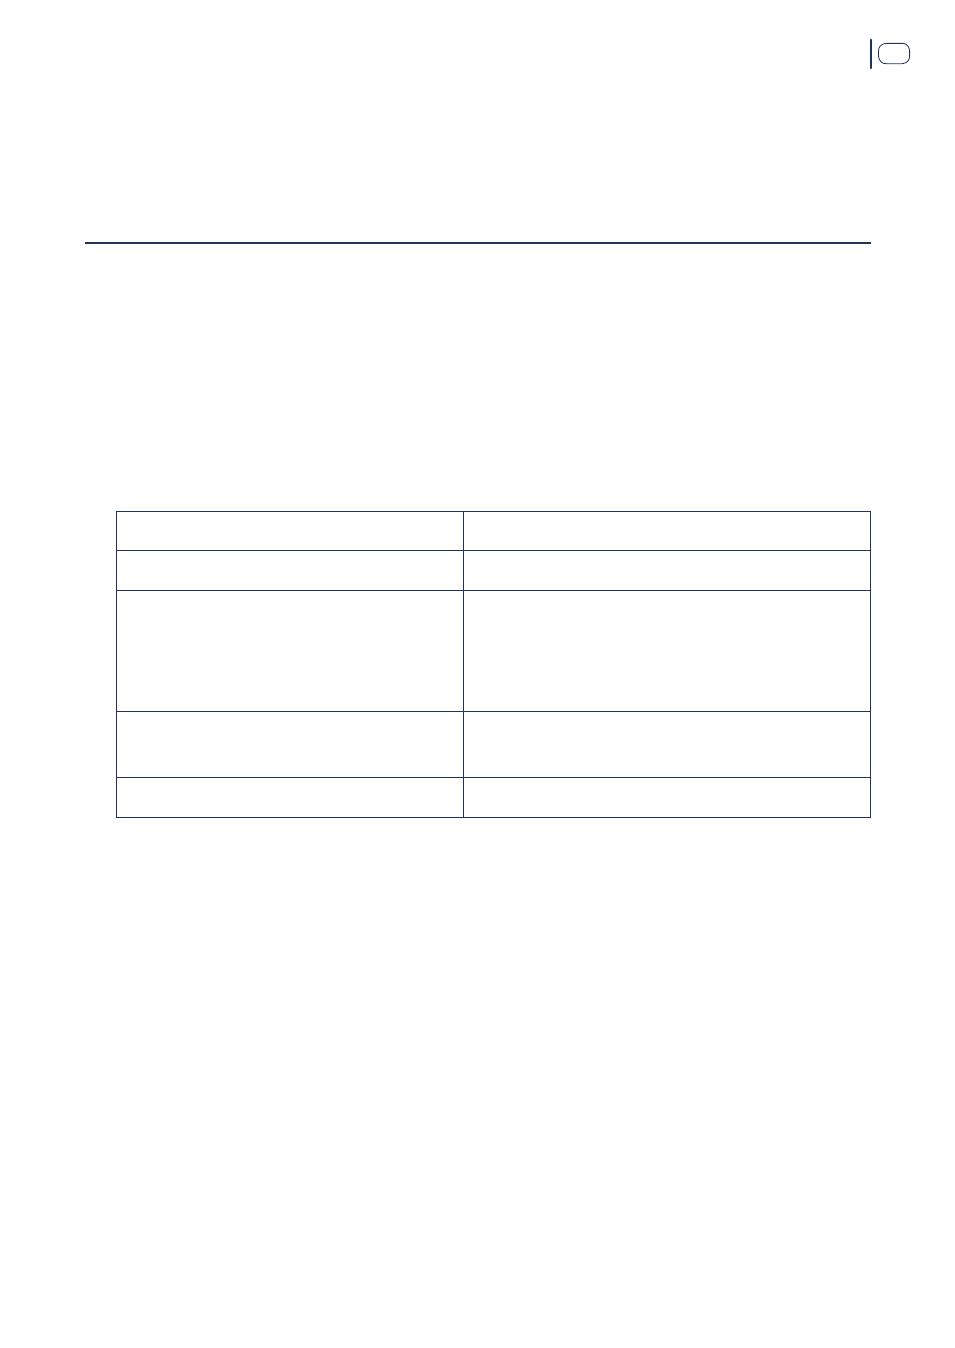 background - Шерхан логикар 1 нет автозапуска коробка автомат